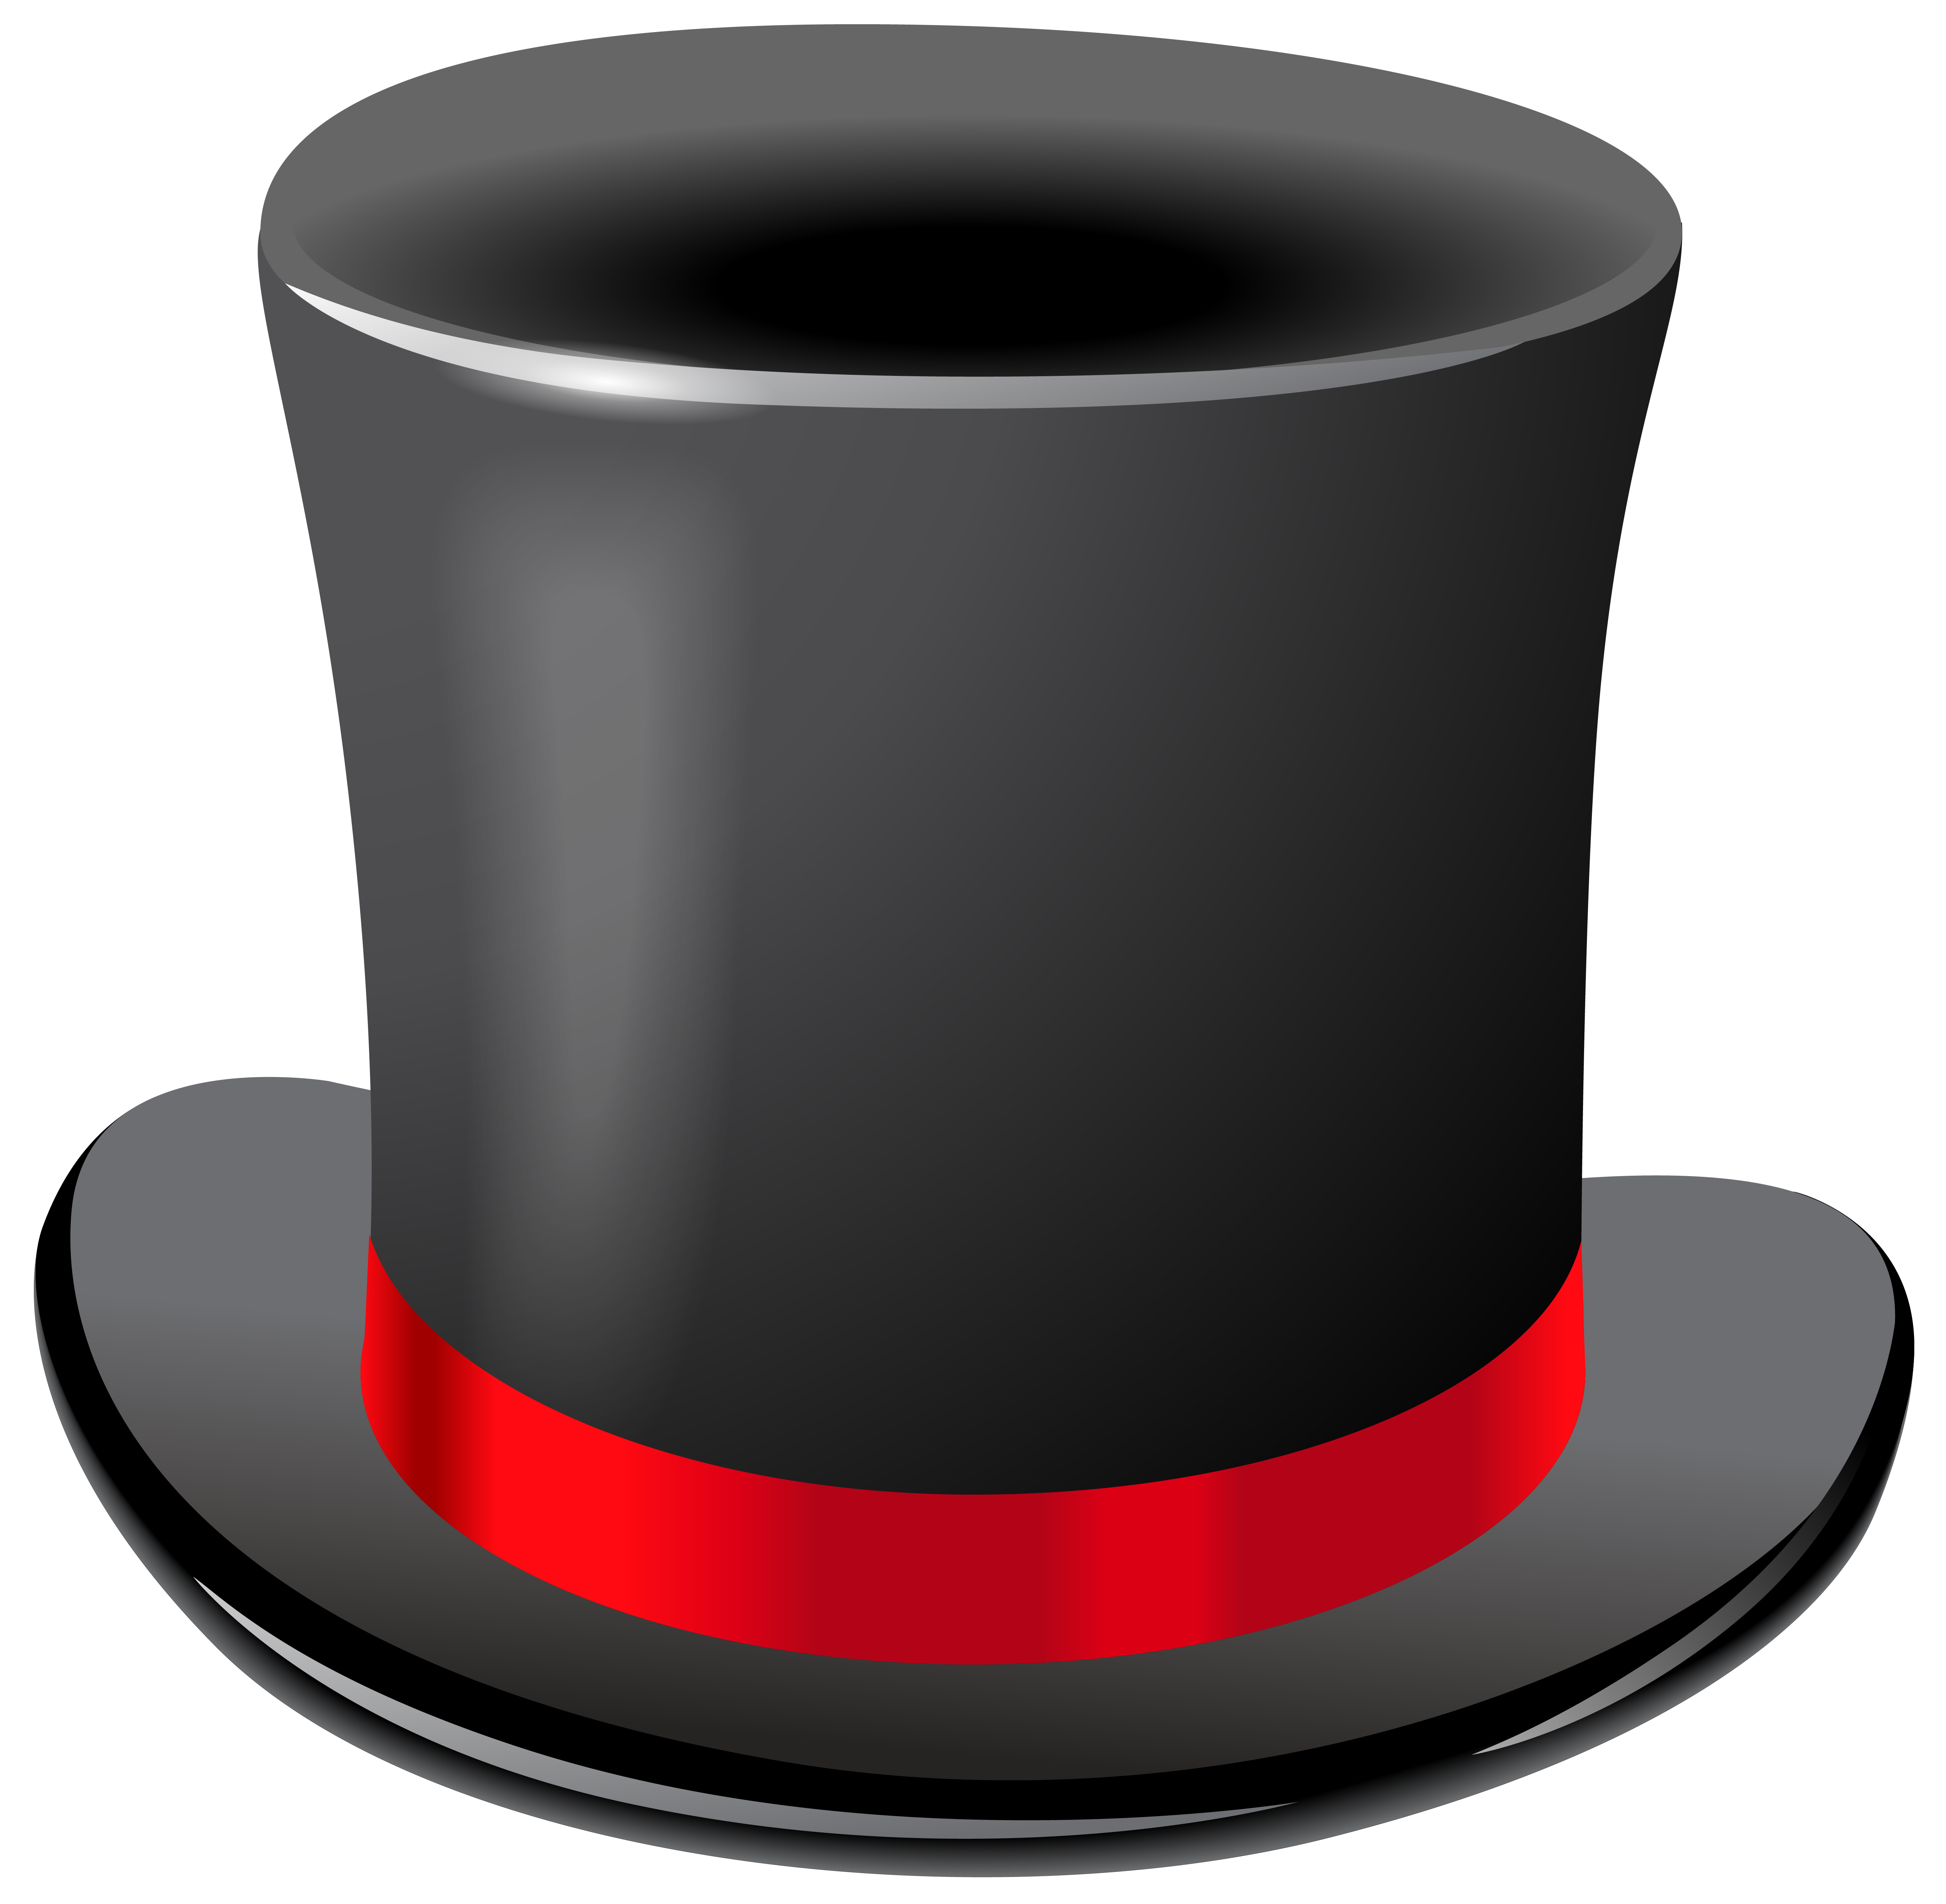 5463x5344 Black Top Hat Transparent Png Clip Art Imageu200b Gallery